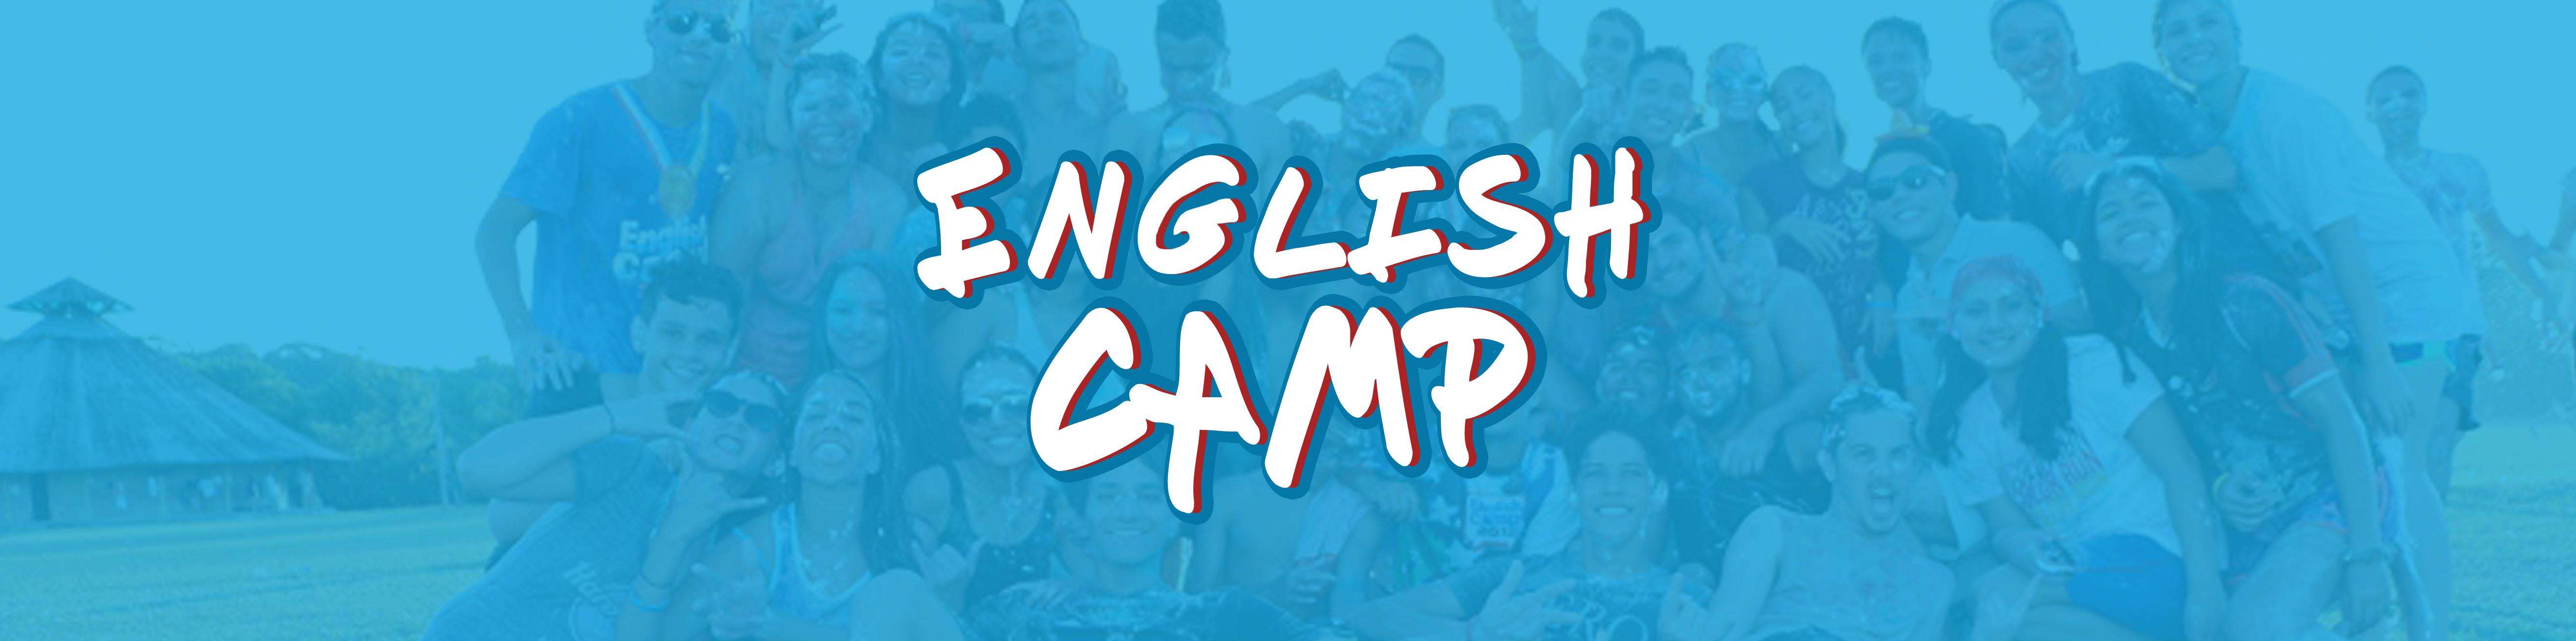 Banner English Camp